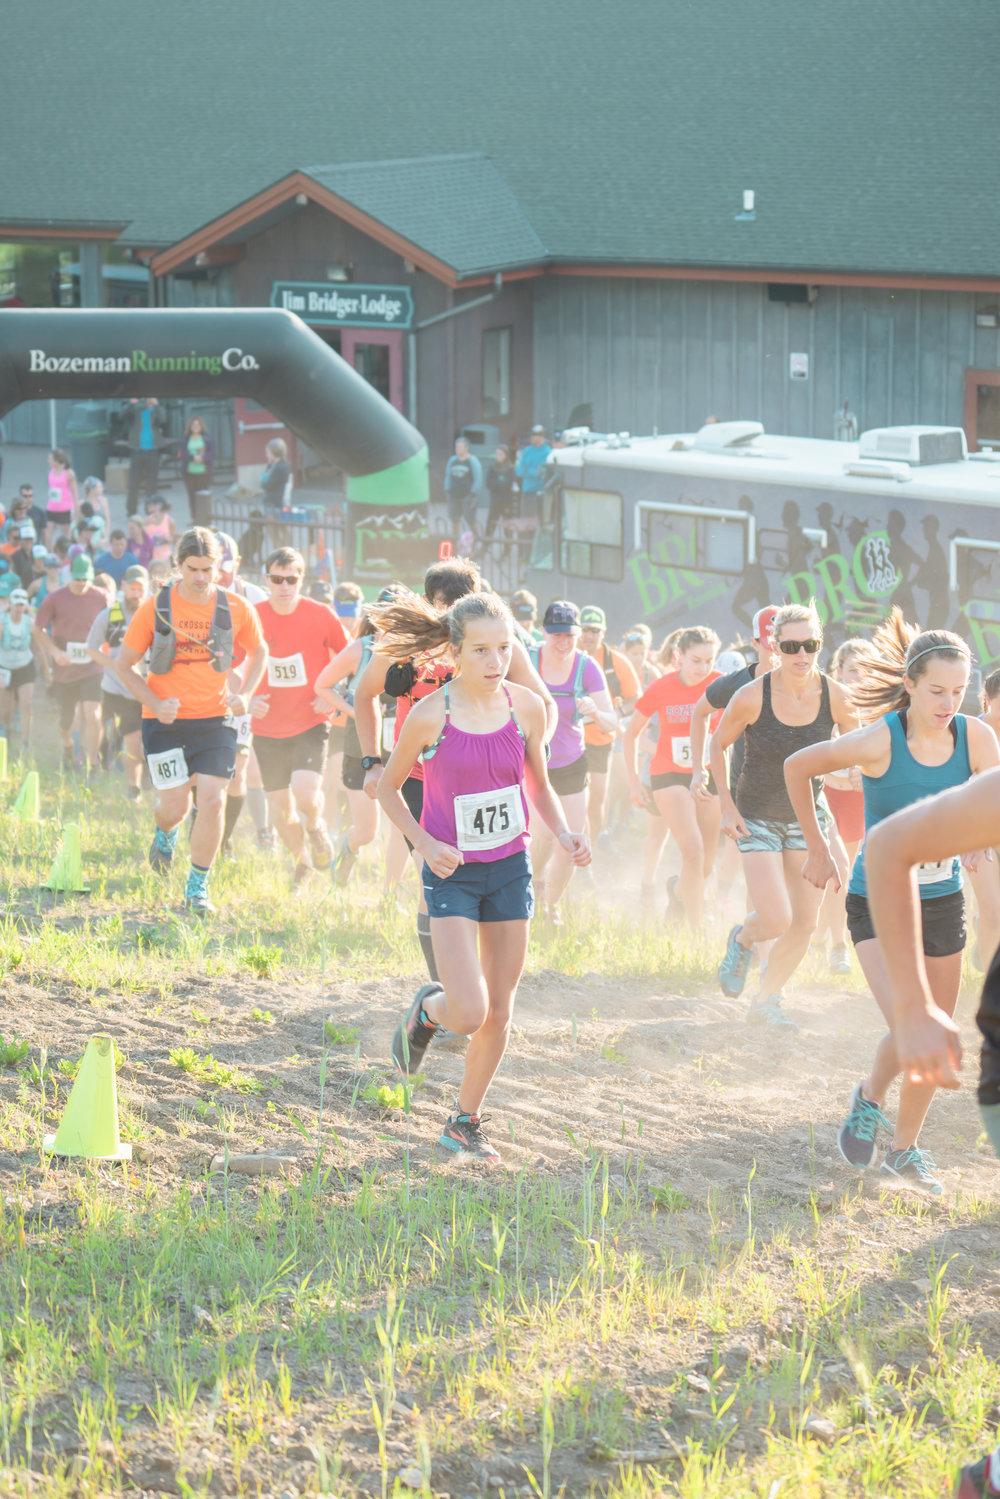 Runners start Bozeman Running Co. racing of Crosscuts at Bridger Bowl just north of Bozeman, Montana.